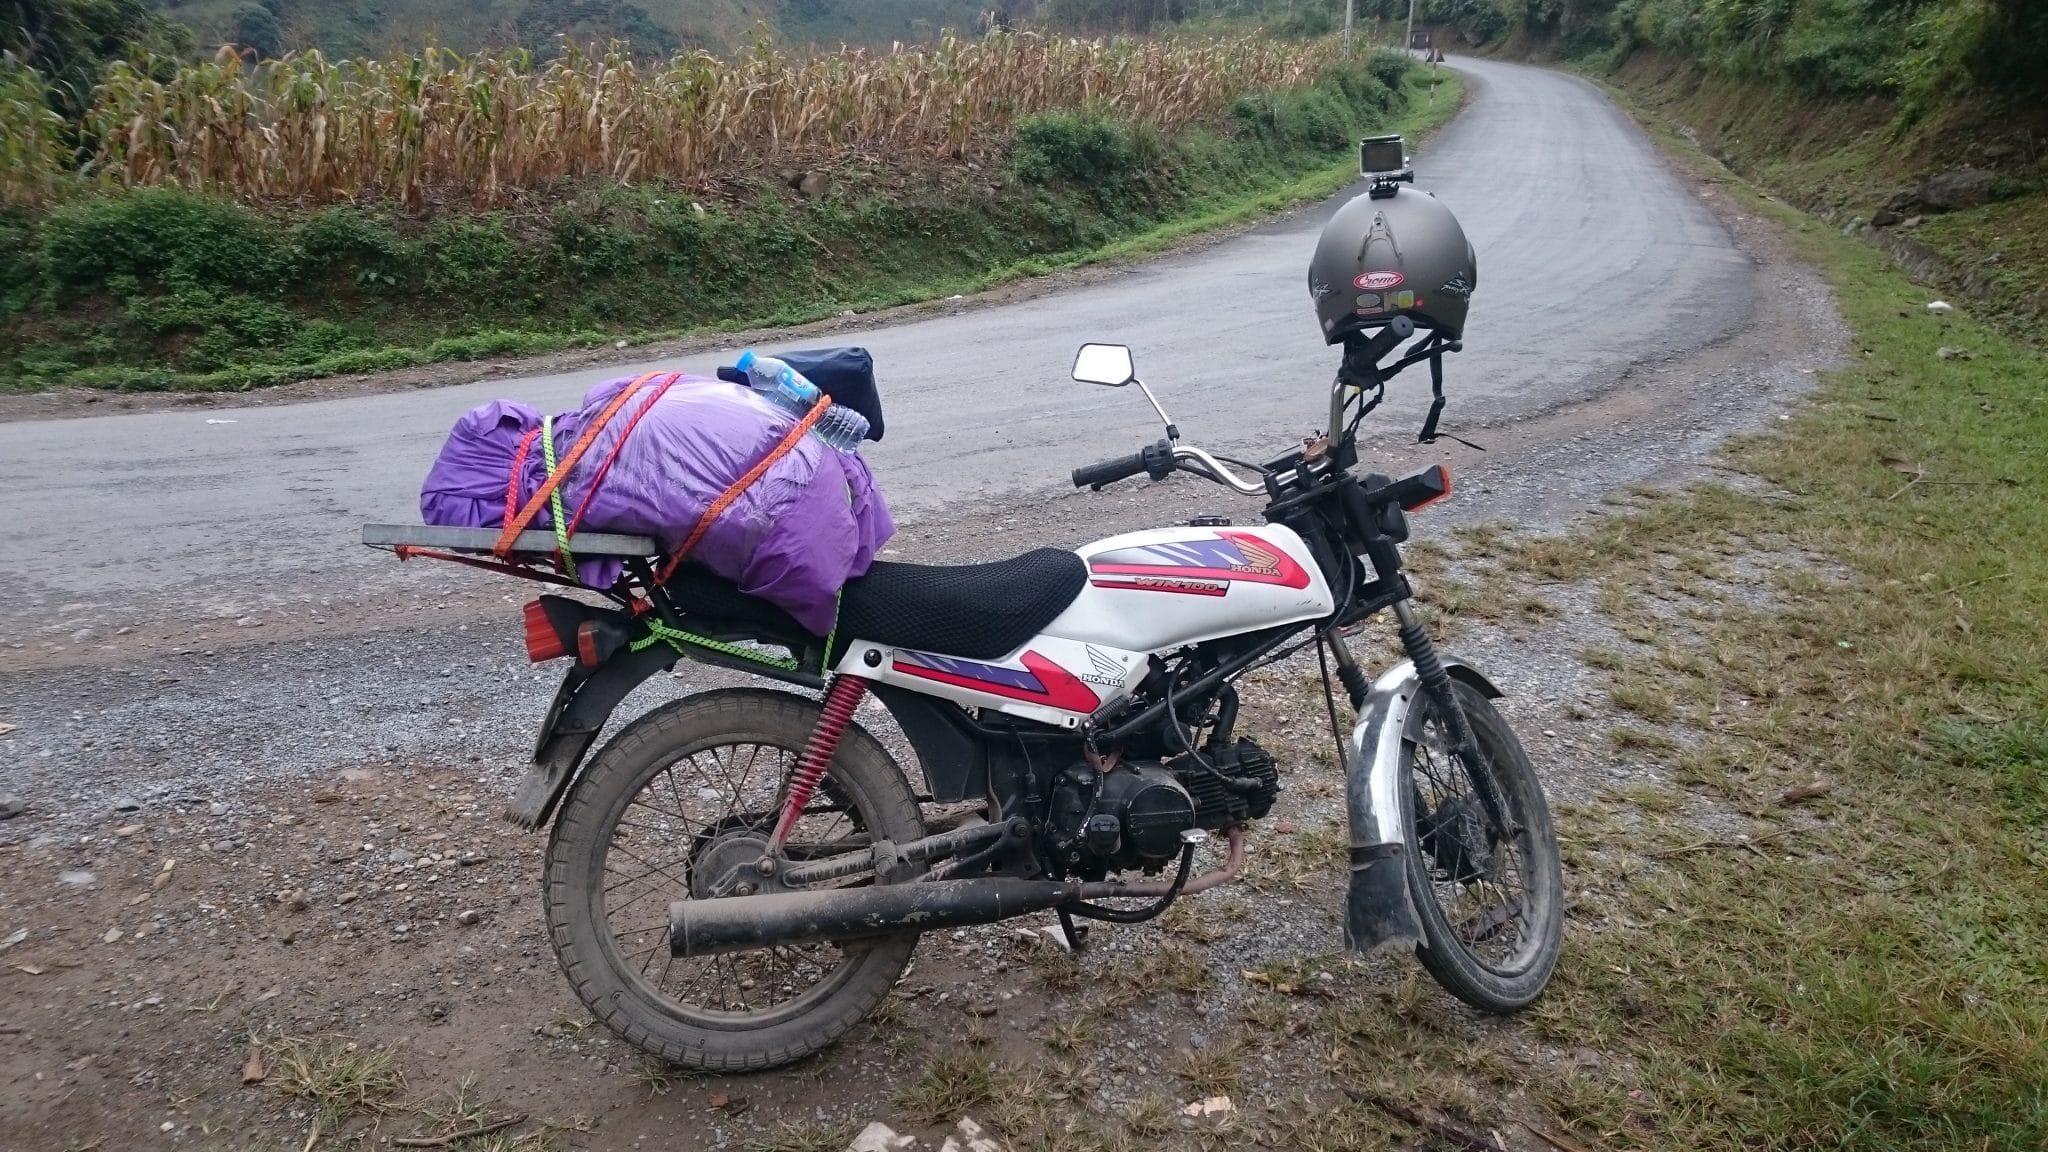 Moto de Cynthia au Vietnam en 2016